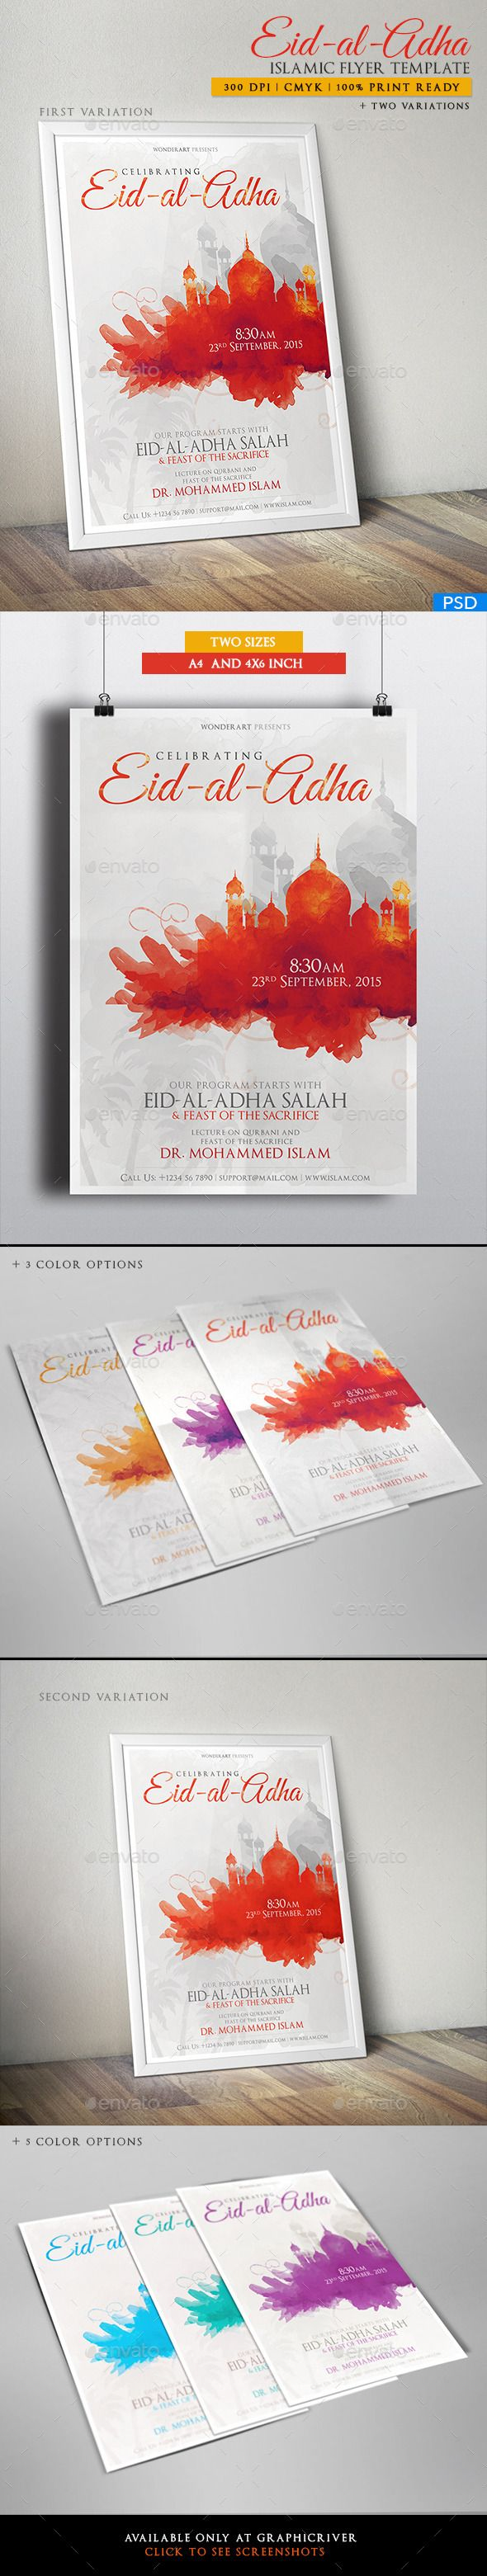 Eid-al-Adha Islamic Celebration Poster / Flyer Template #design Download: http://graphicriver.net/item/eidaladha-islamic-celebration-posterflyer/12752048?ref=ksioks